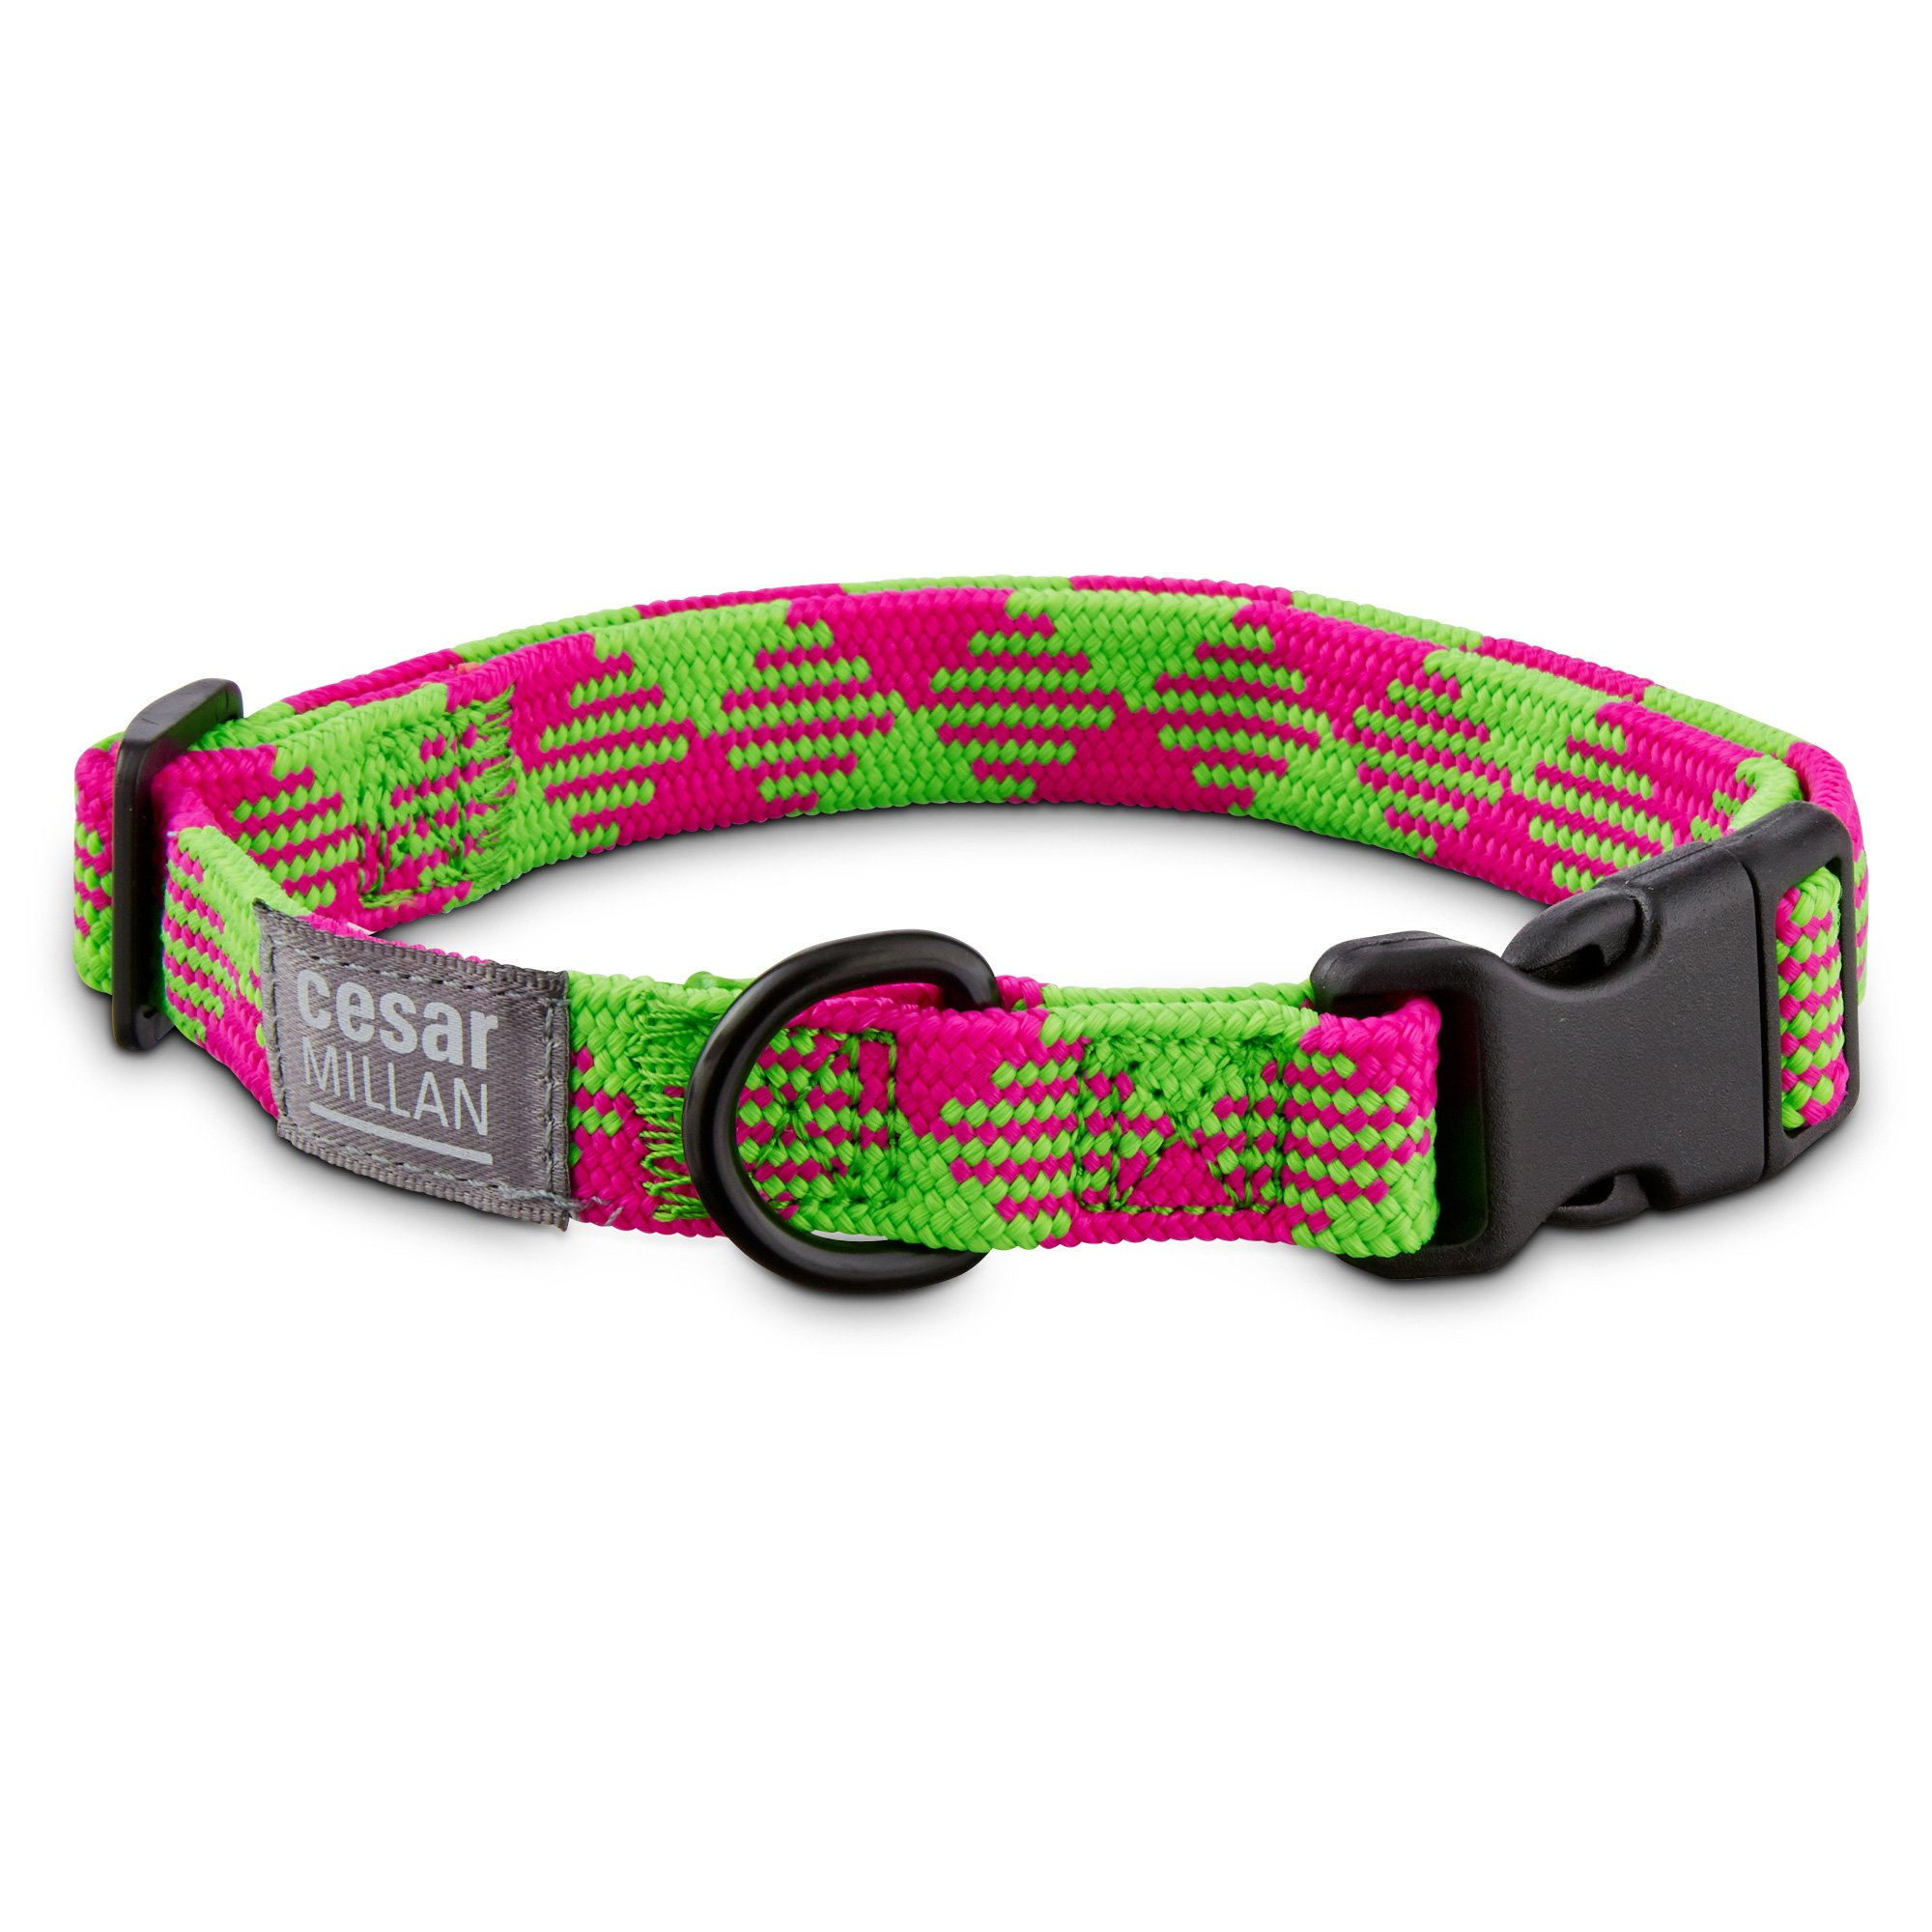 Cesar Millan Braided Brights Pink & Lime Nylon Dog Collar